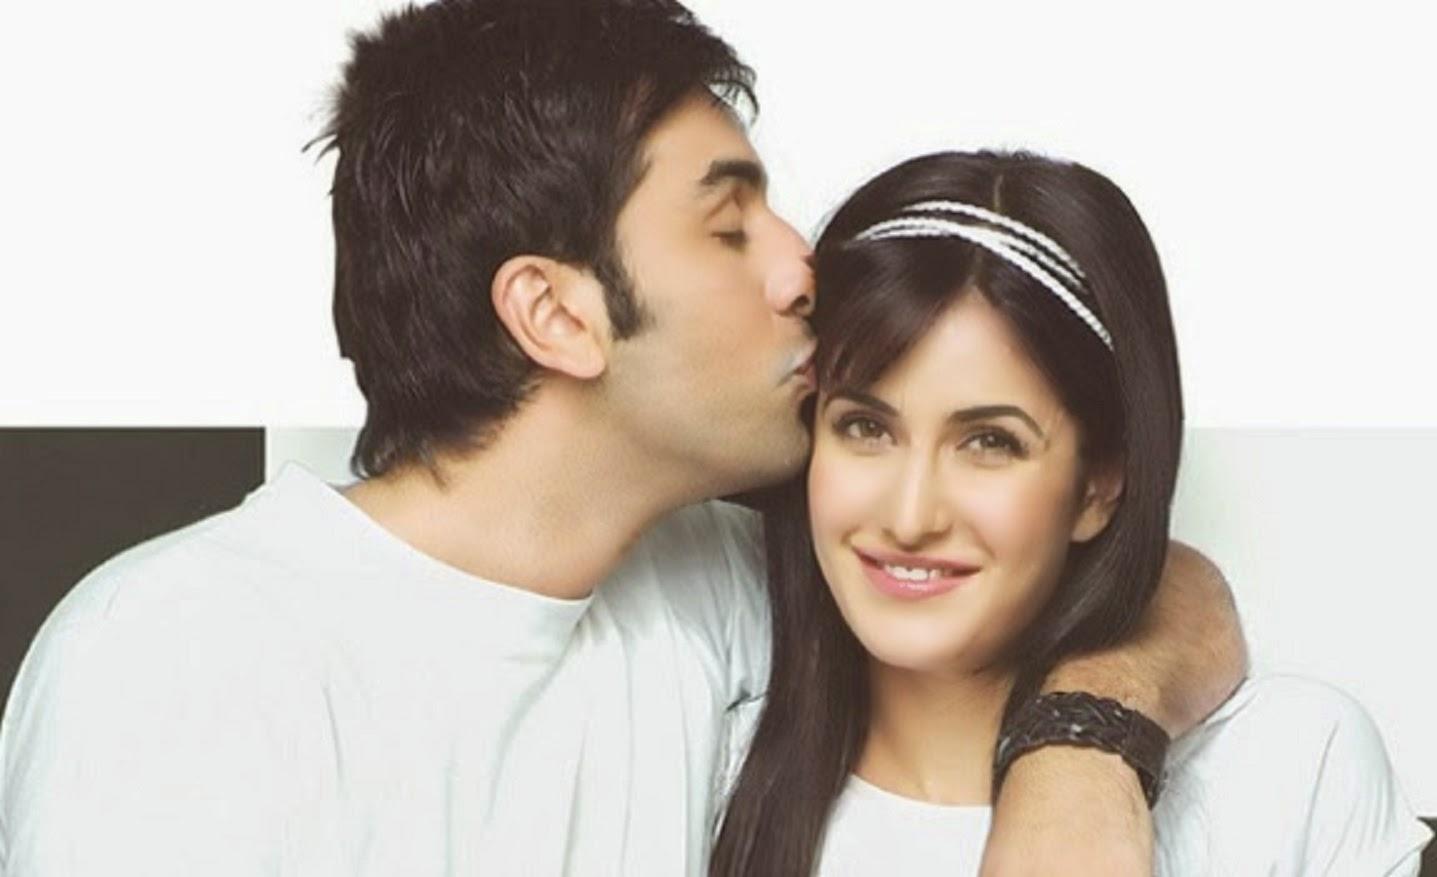 Wallpapers Katrina Kaif And Ranbir Kapoor Cute Couple wallpapers 1437x877